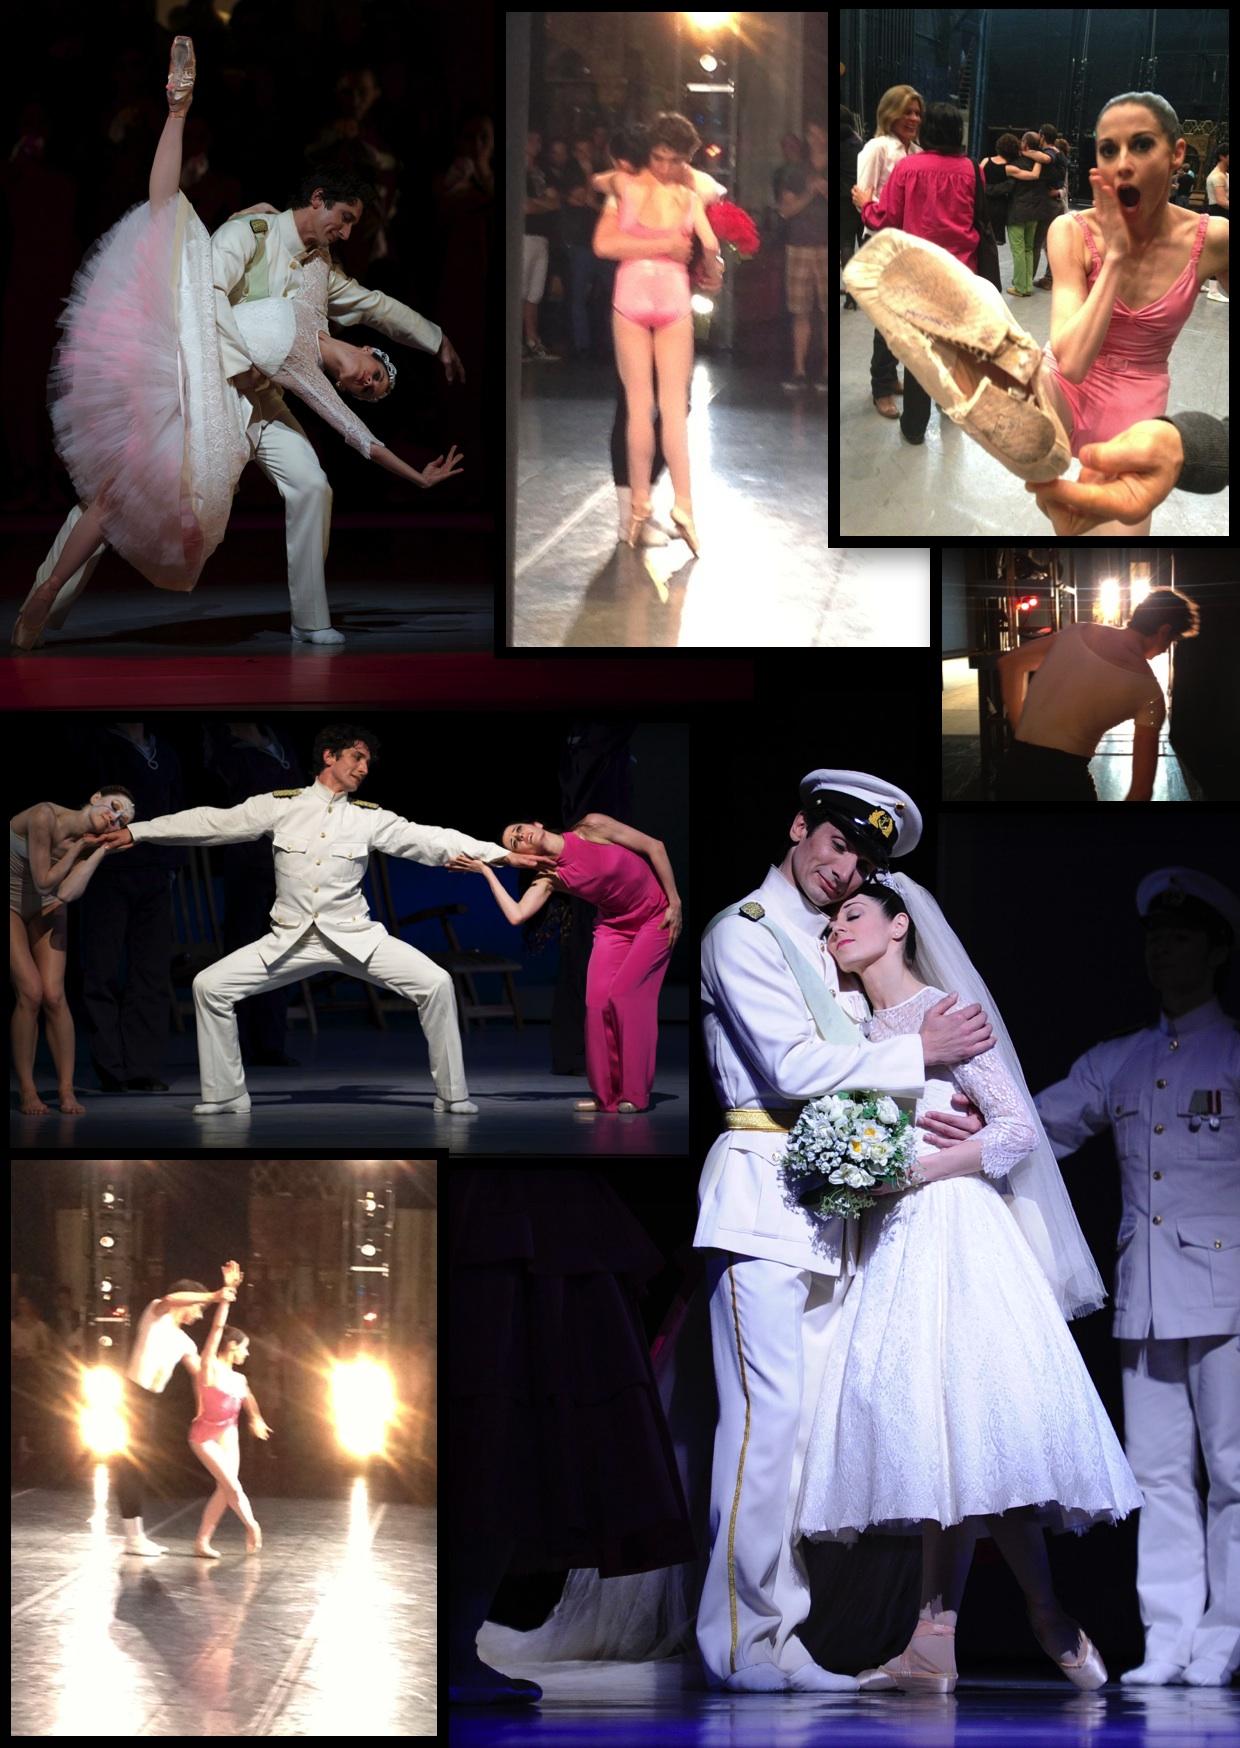 Partnerpictured: Vanessa Zahorian  Ballet/Choreographer: Neumeier's  The Little Mermaid ; Balanchine's  Symphony in Three Movements   Photographer: Erik Tomasson, Regina Bustillos, Ken Ryan